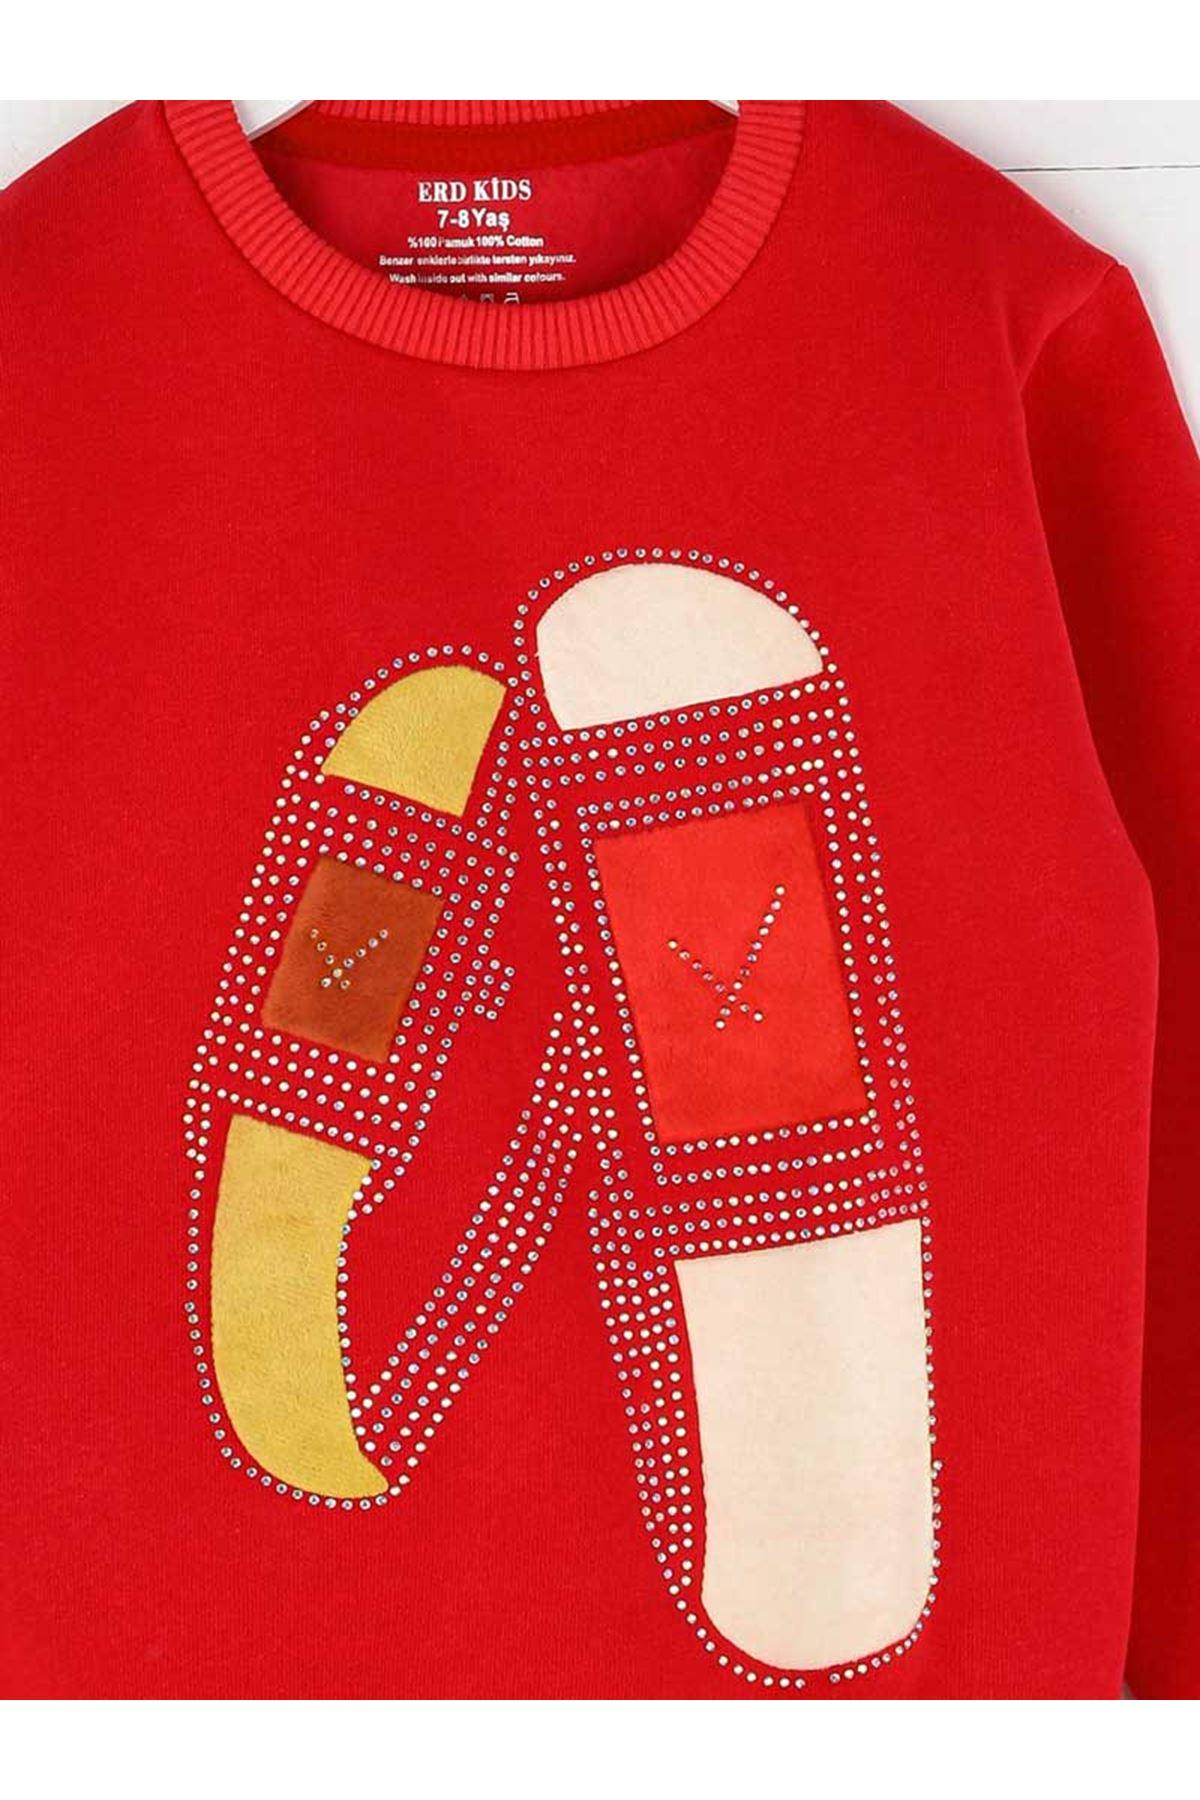 Red Winter Female Child Sweatshirt